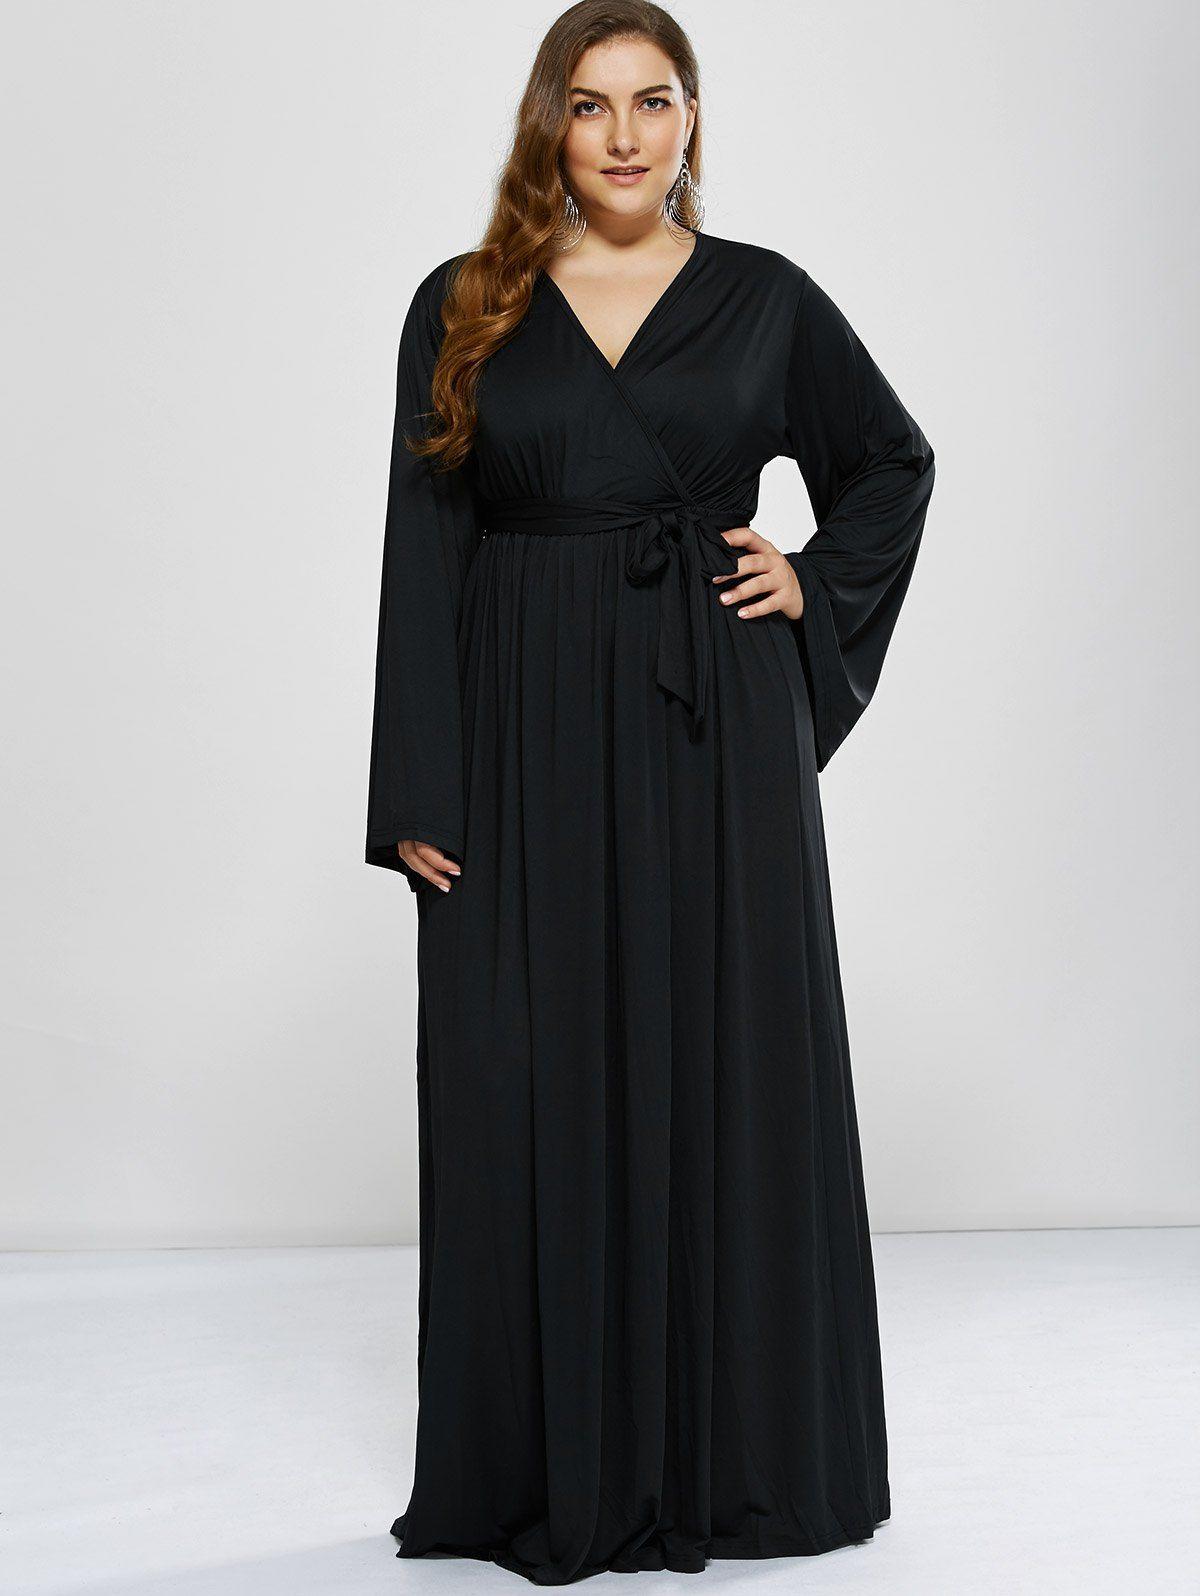 rosegal   Waistline dress, Clothes design, Plus dresses